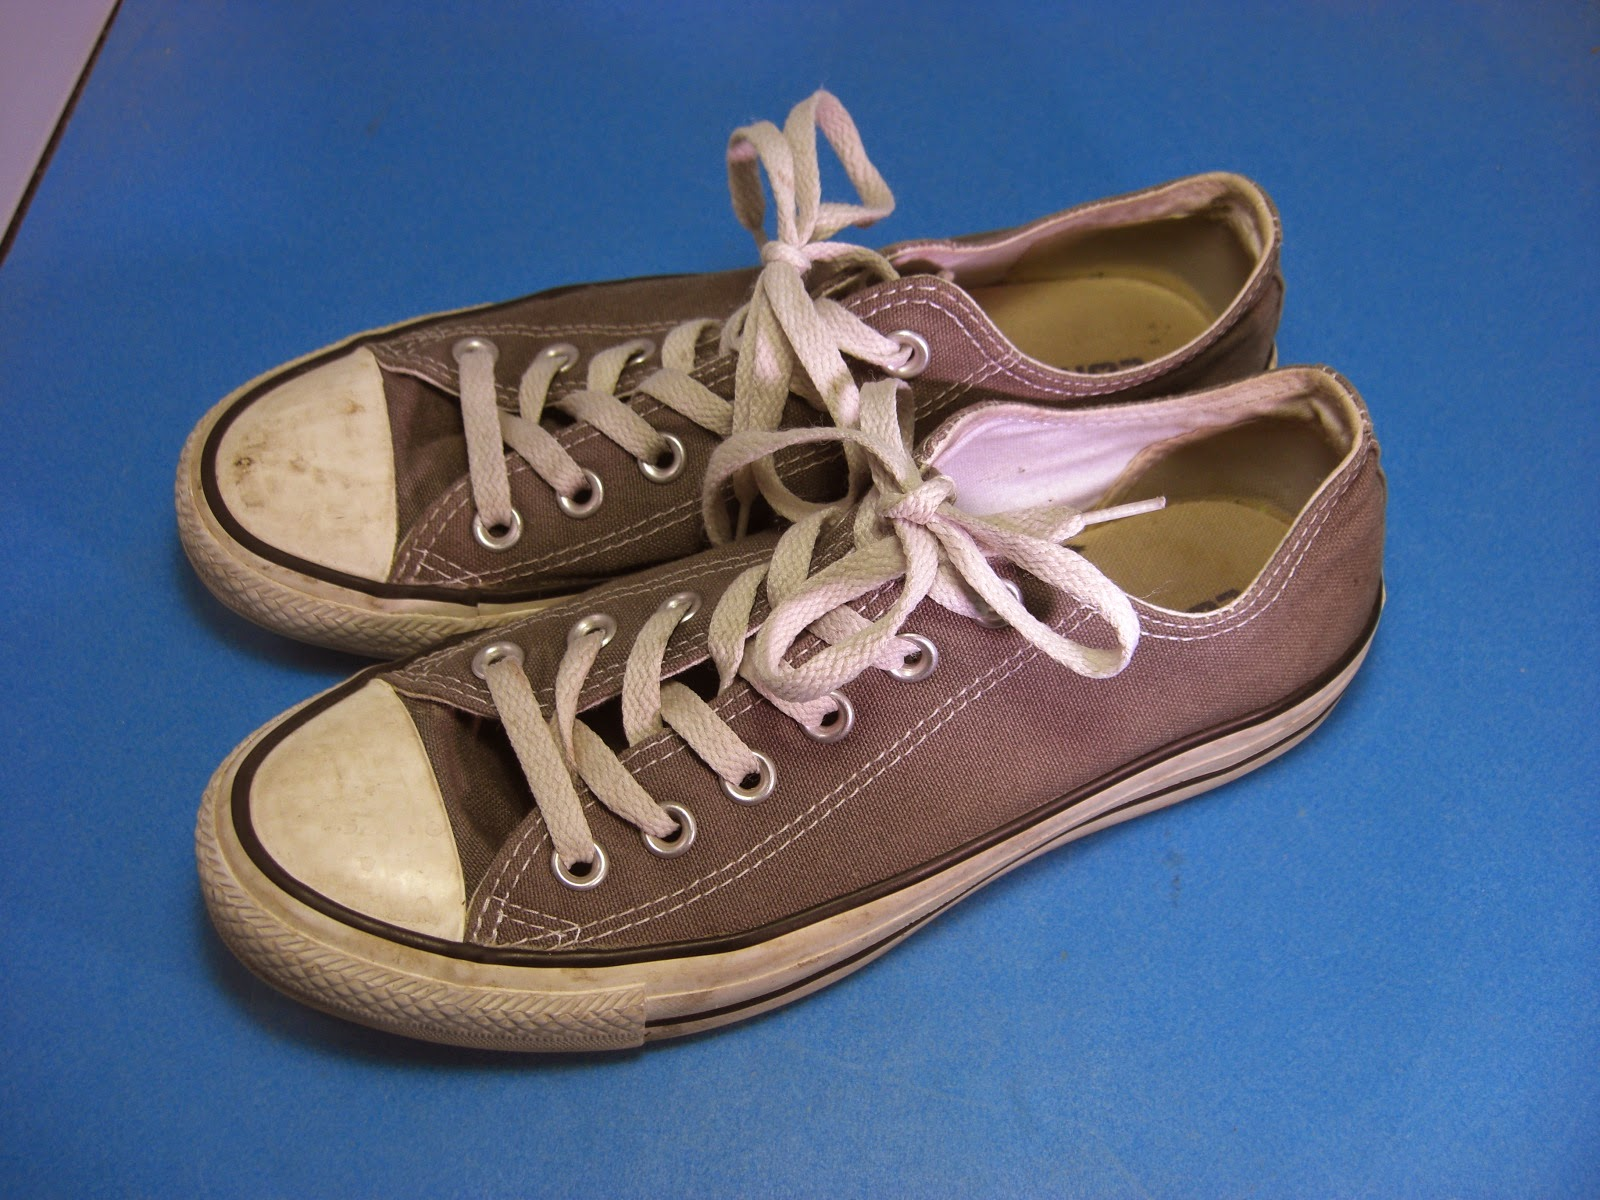 http://bargaincart.ecrater.com/p/20523976/converse-signature-unisex-gray-sneakers?keywords=converse